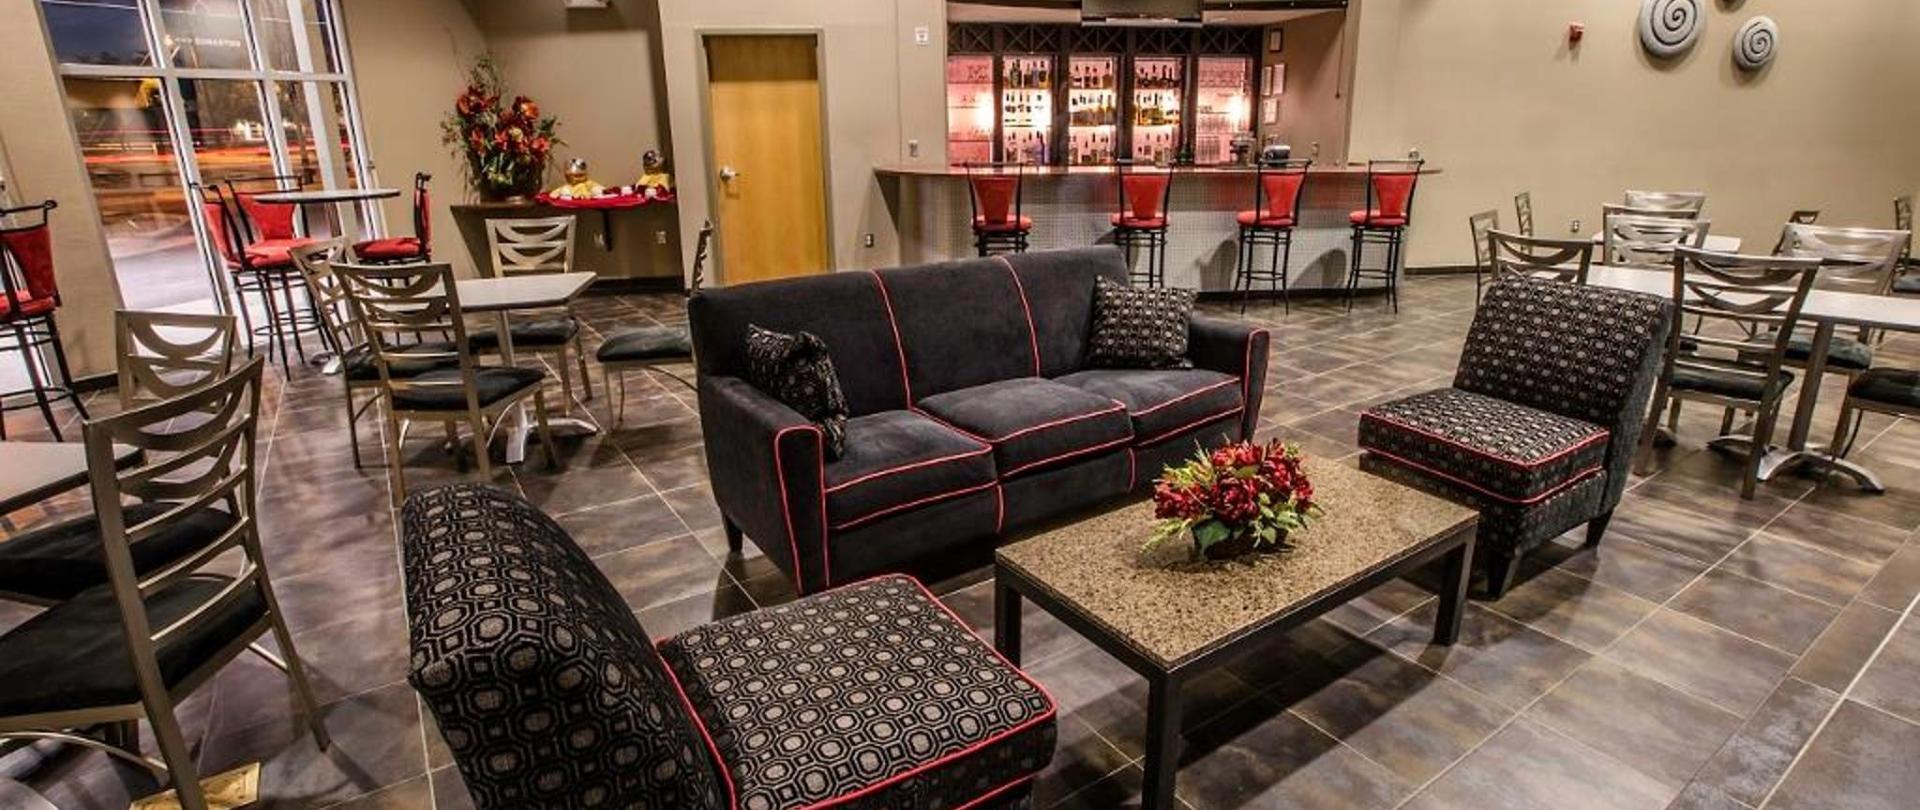 Hotel Artesia In New Mexico United States Of America